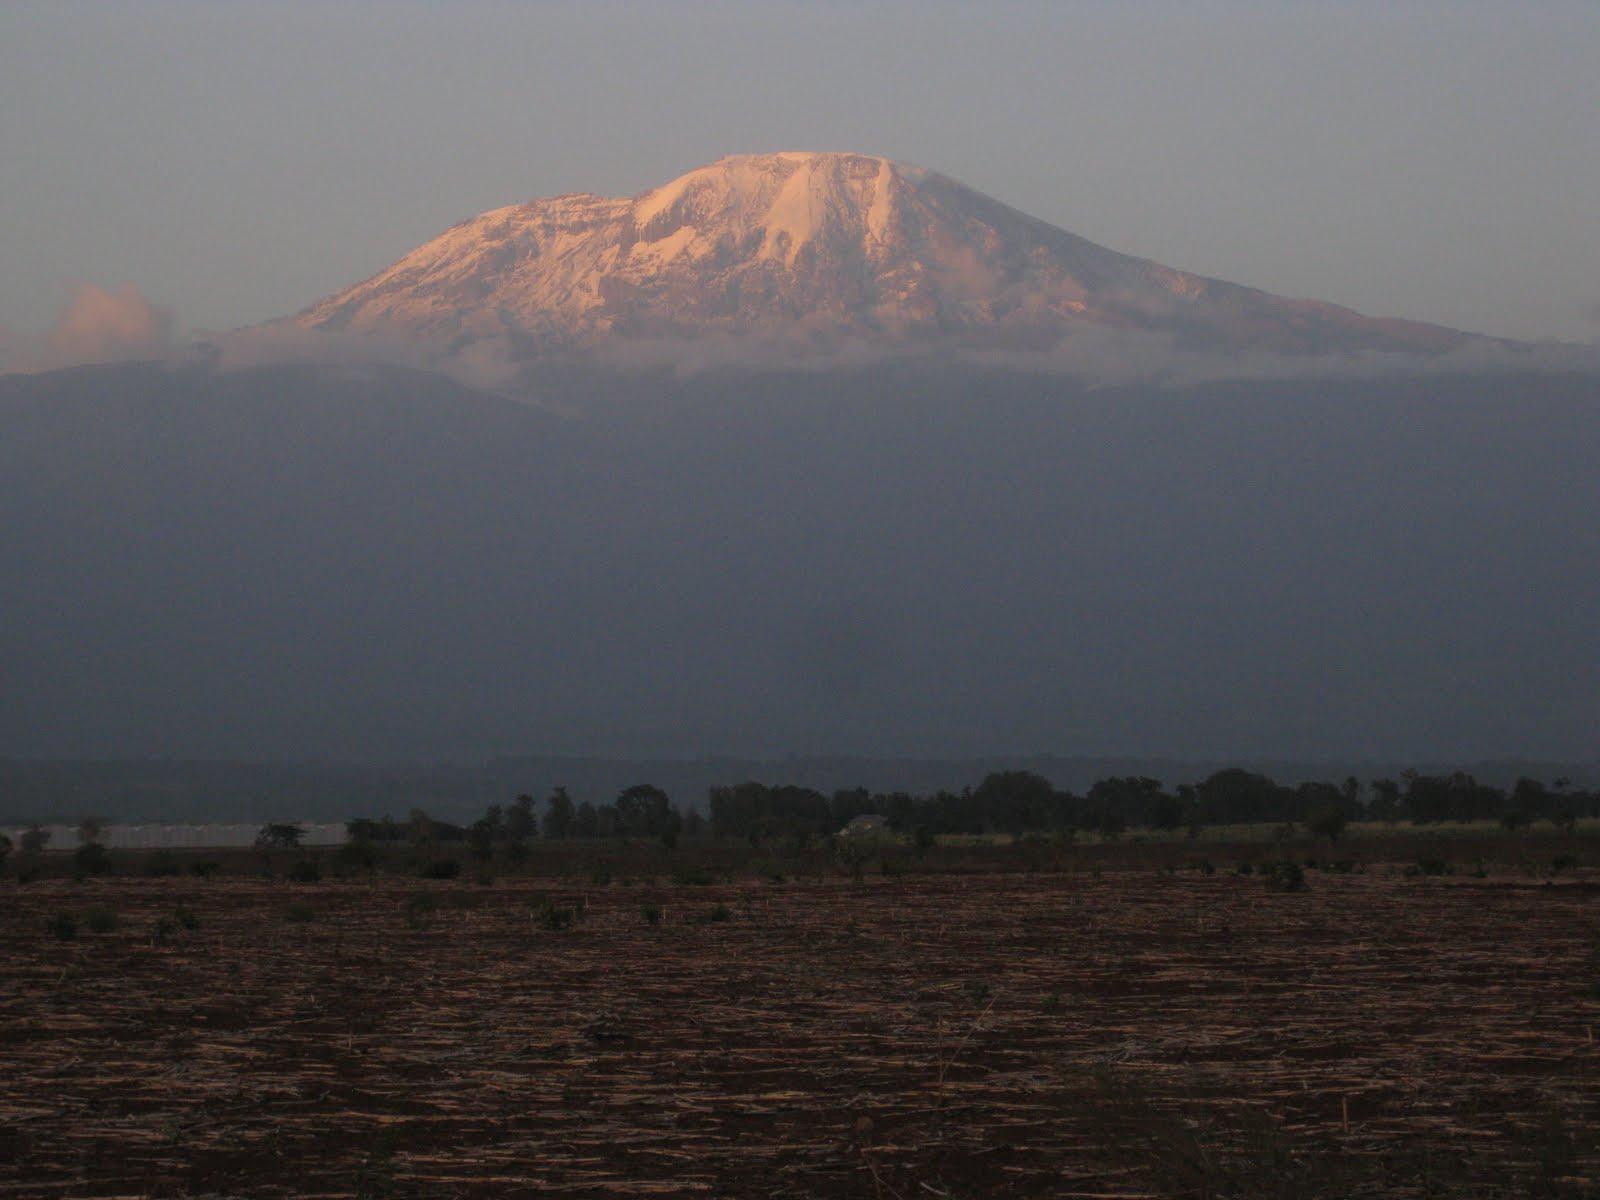 wp-content/uploads/itineraries/Kilimanjaro/kili-mountain.jpg